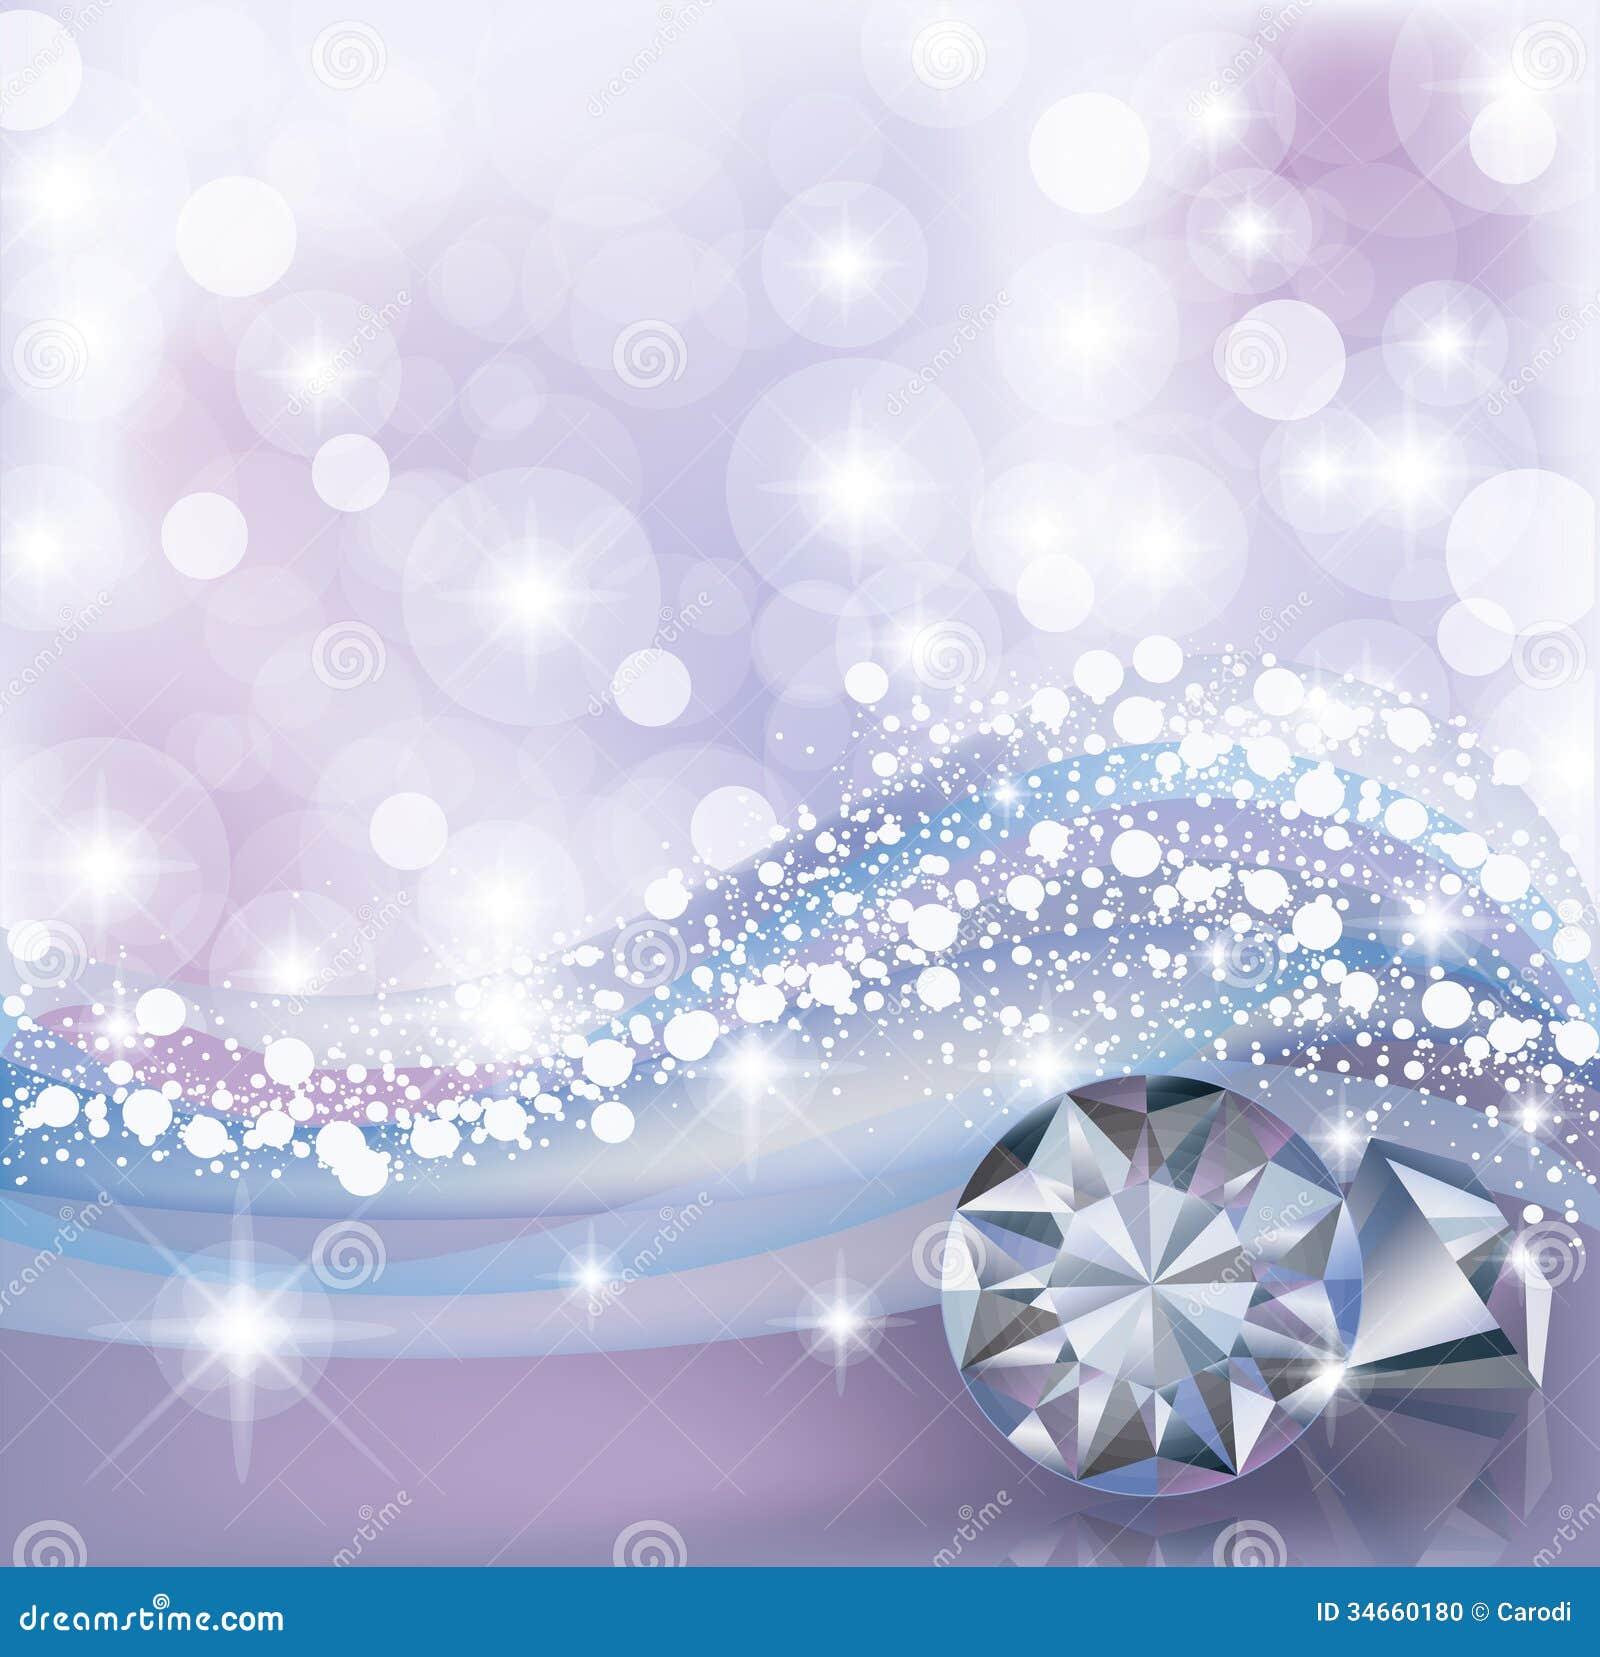 Winter Card With Diamonds Stock Photo - Image: 34660180